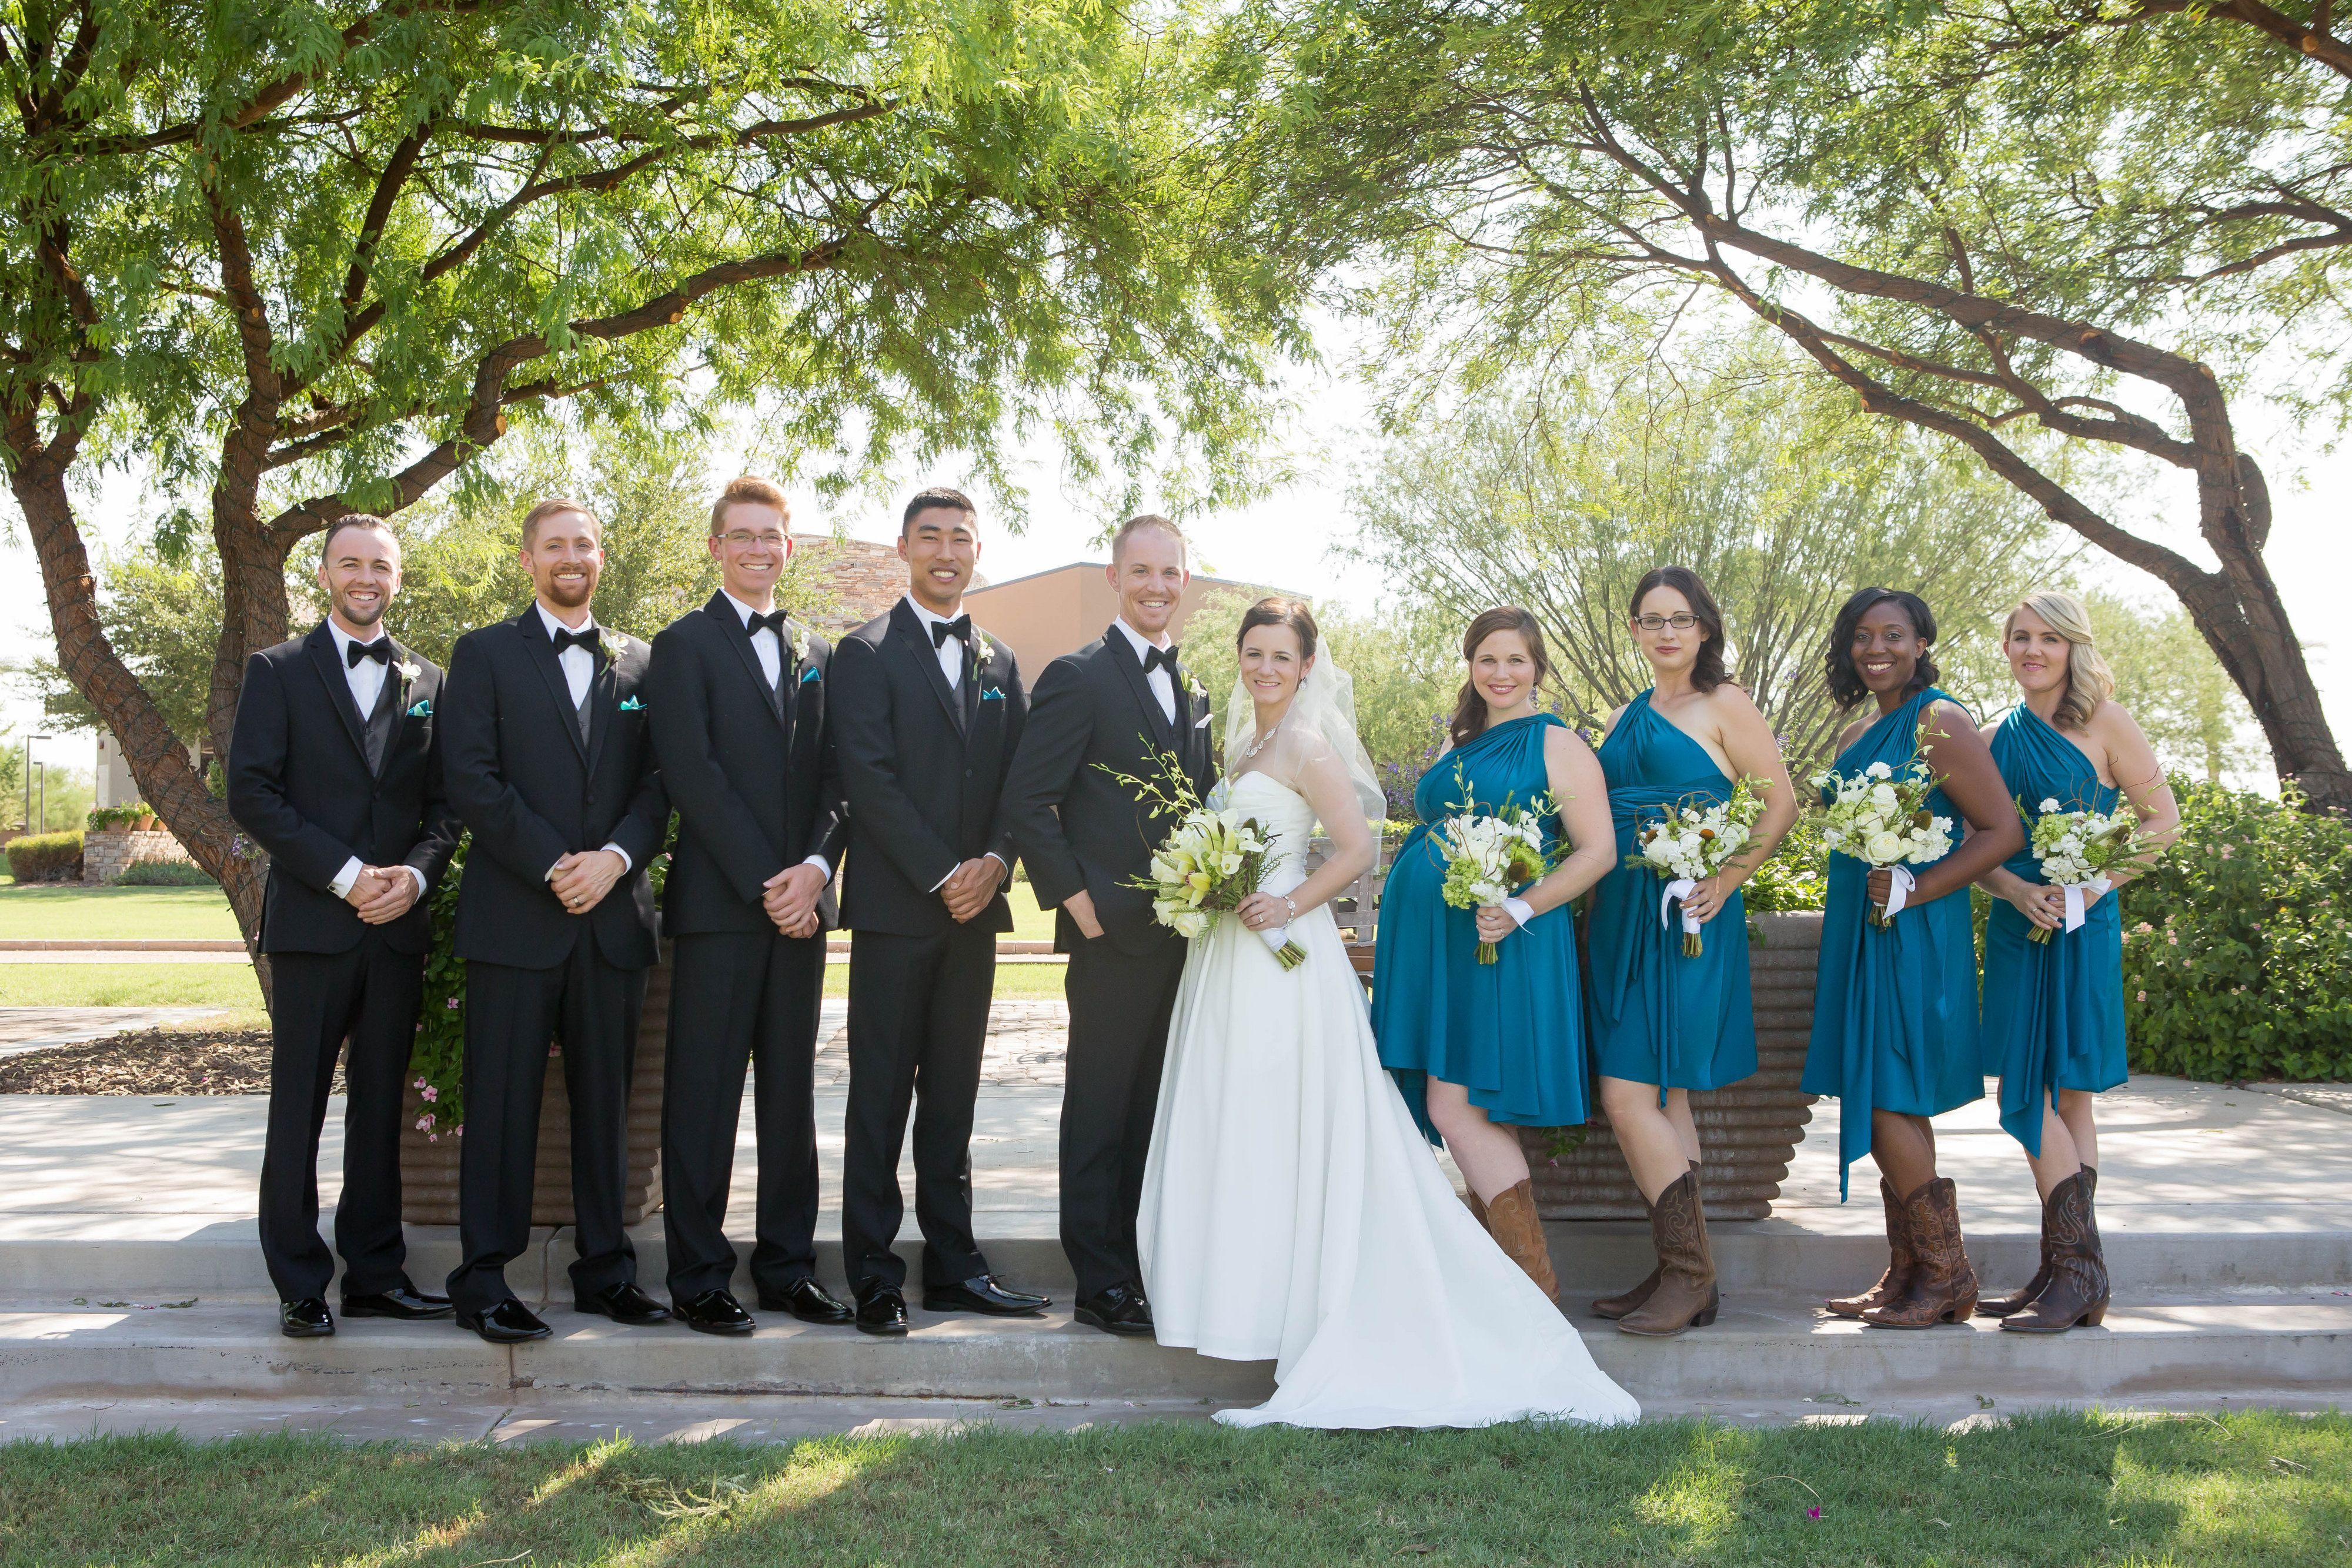 Trilogy at vistancia weddings arizona wedding venue blue